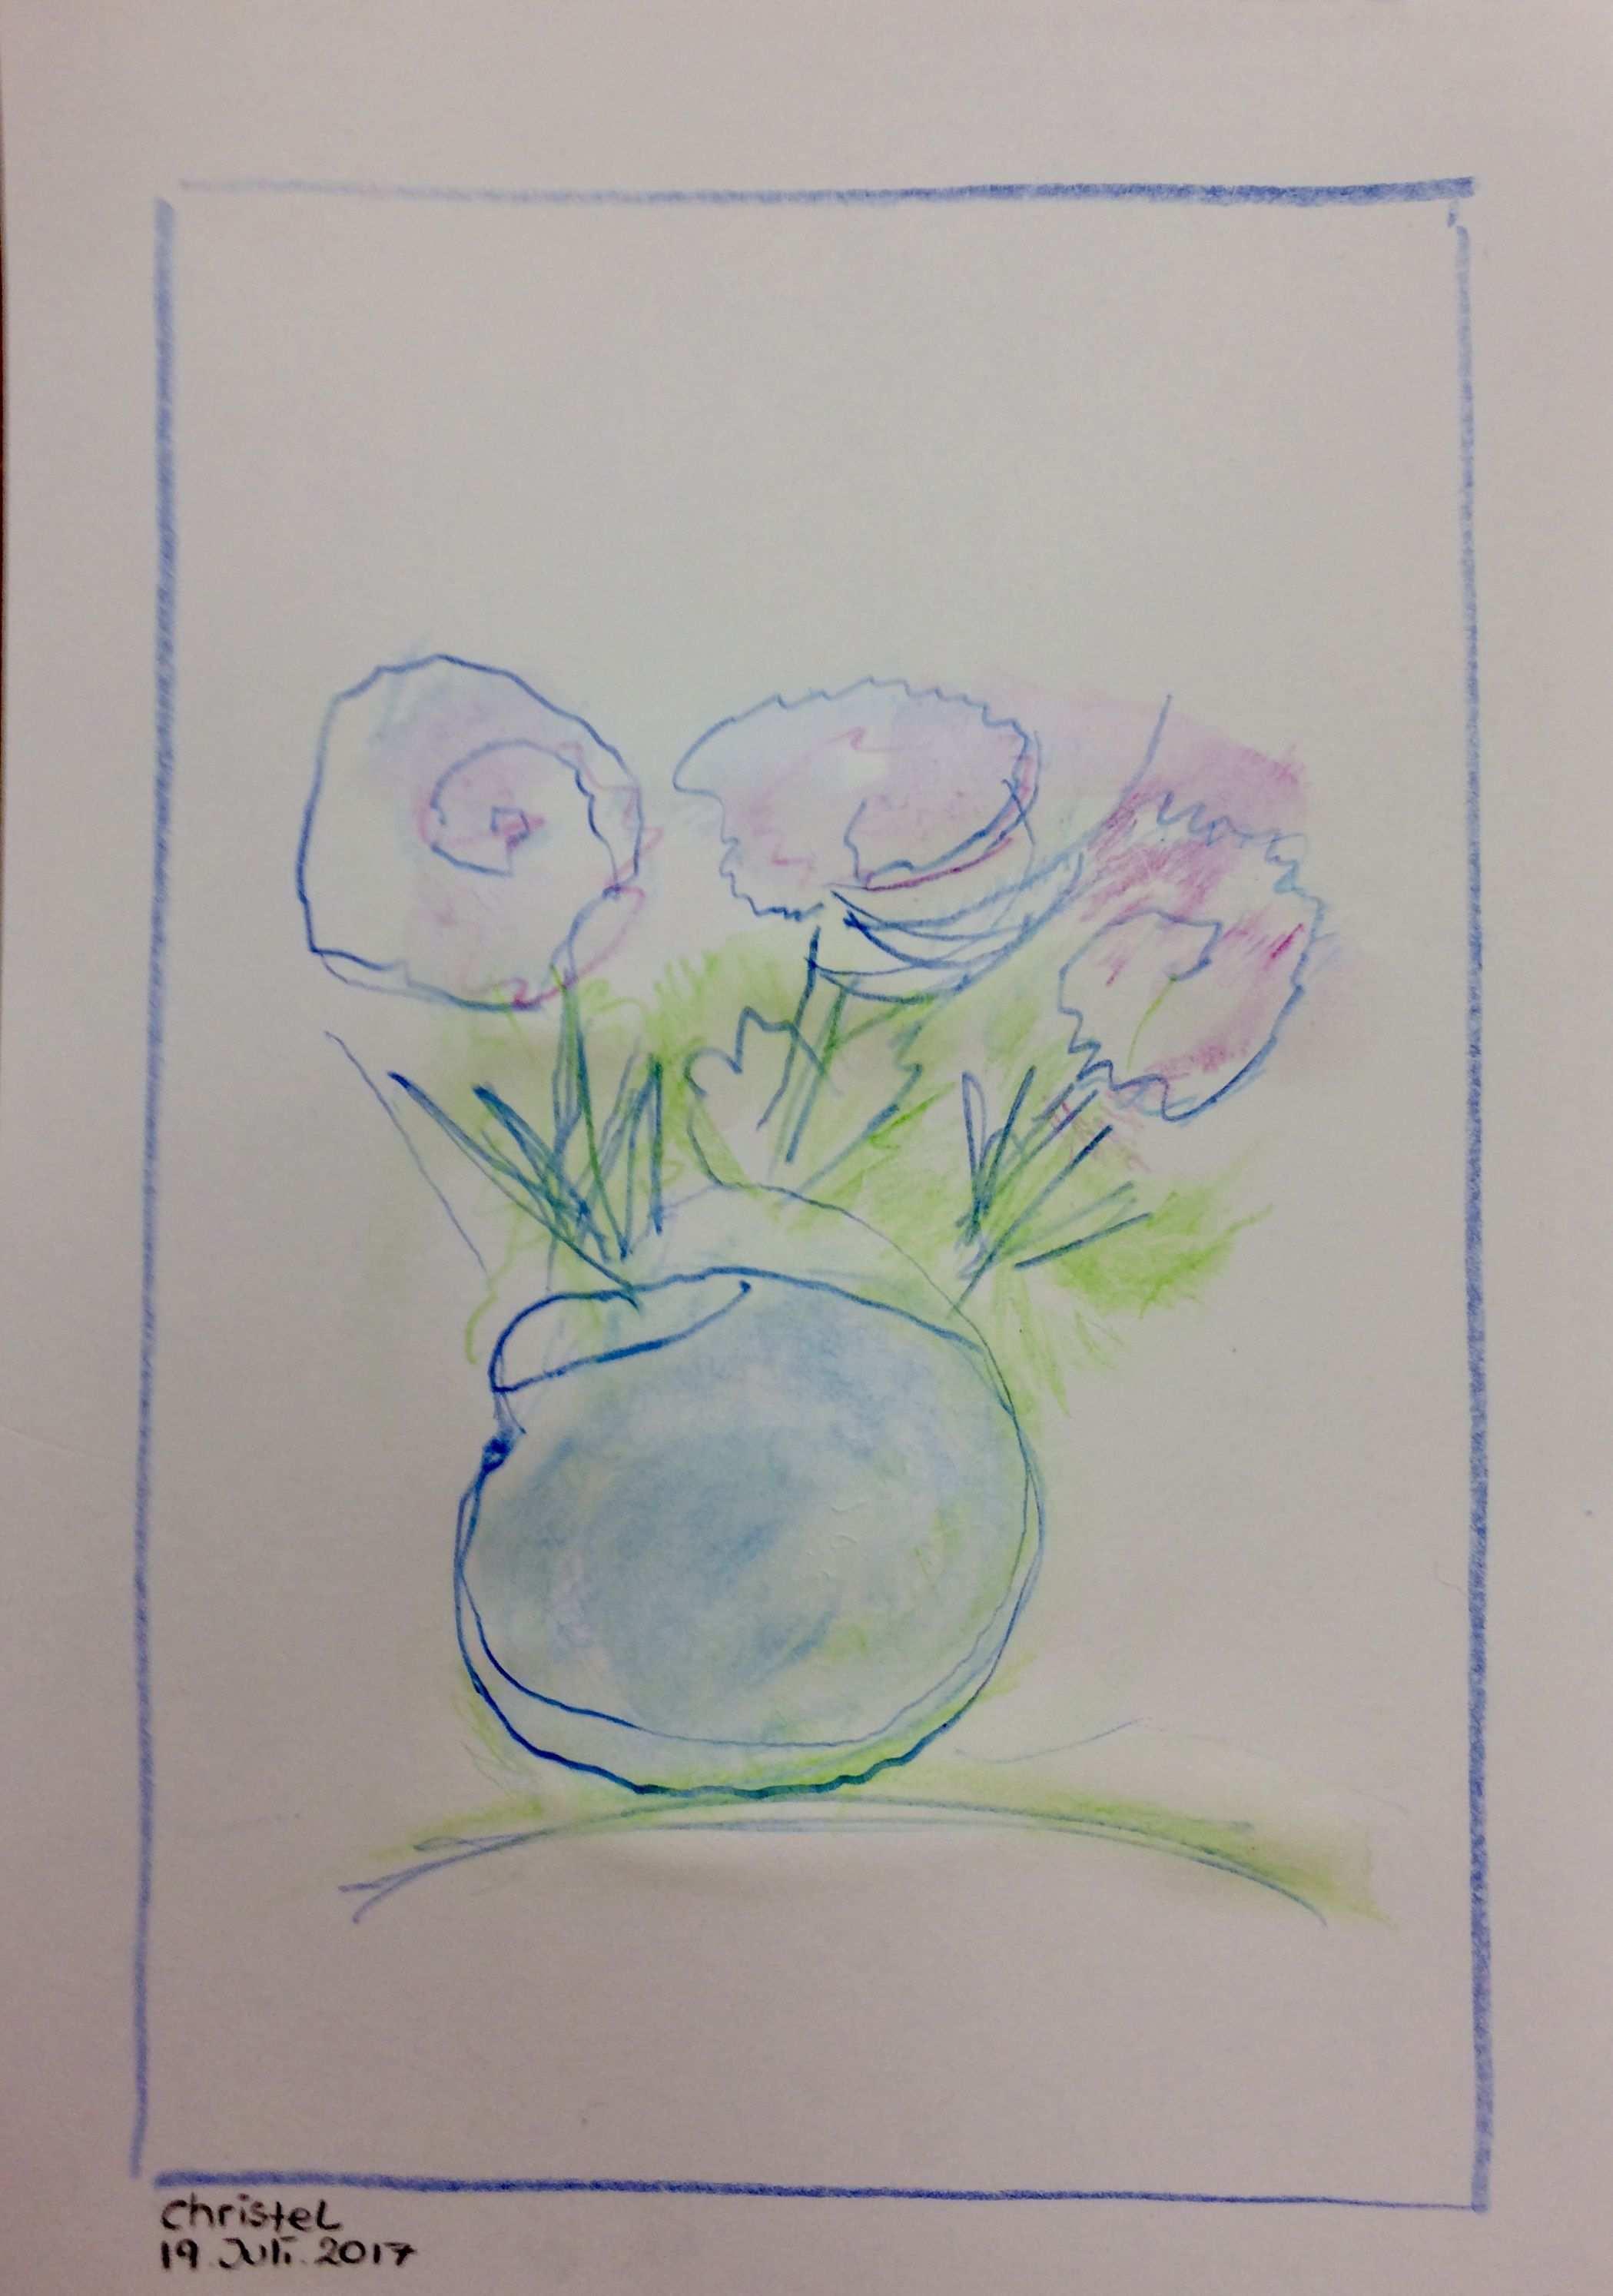 Christl Blumen Mit Vase Aquarellstifte Teilnehmer Der Tagesbetreuung 1 Aquarellstift Kunstprojekte Aquarell Stifte